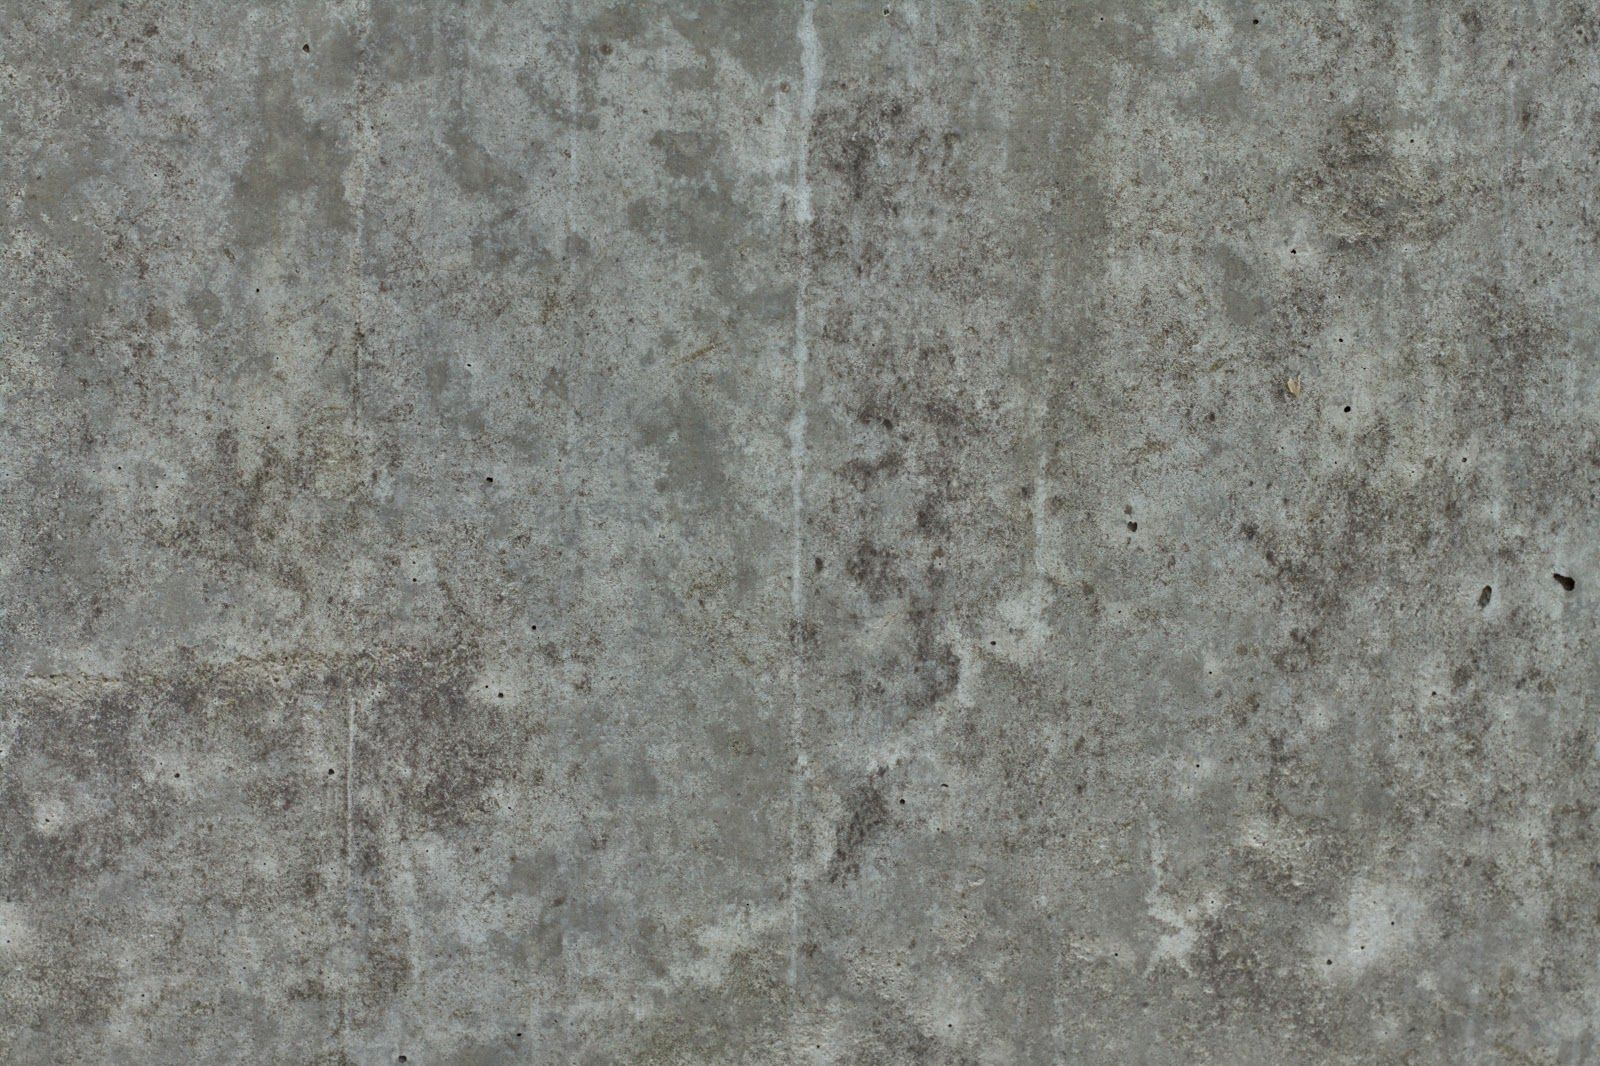 Concrete Granite Wall Smooth Dirt Pillar Texture Ver 9